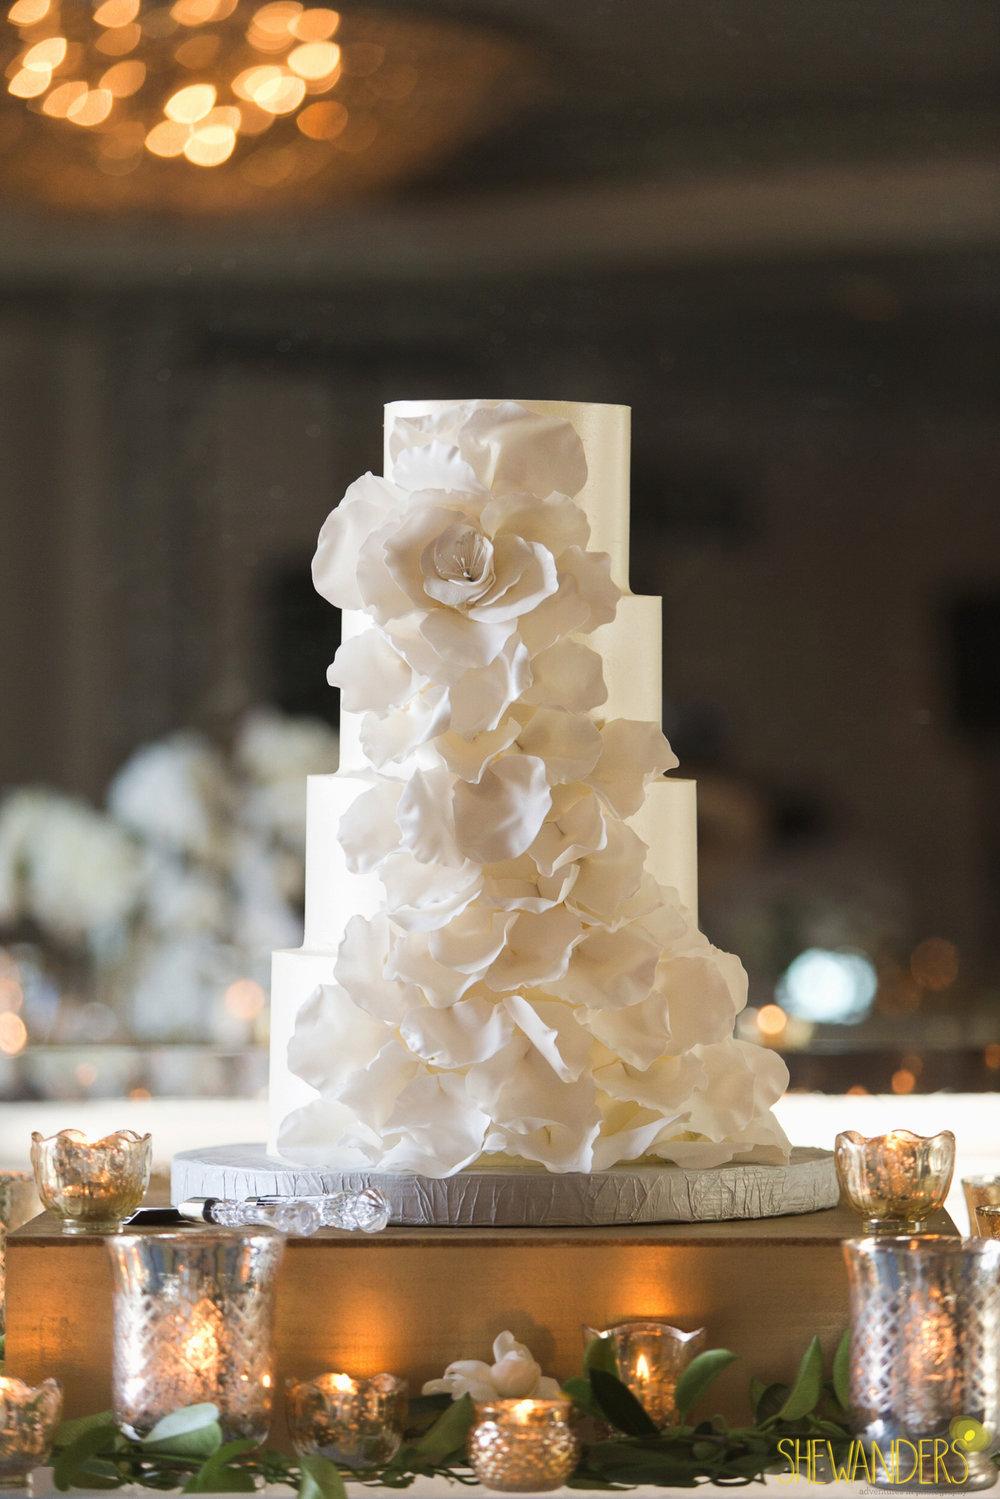 Shewanders.Coronado.Wedding.LaurenJessica-1033.jpg.Wedding.LaurenJessica-1033.jpg